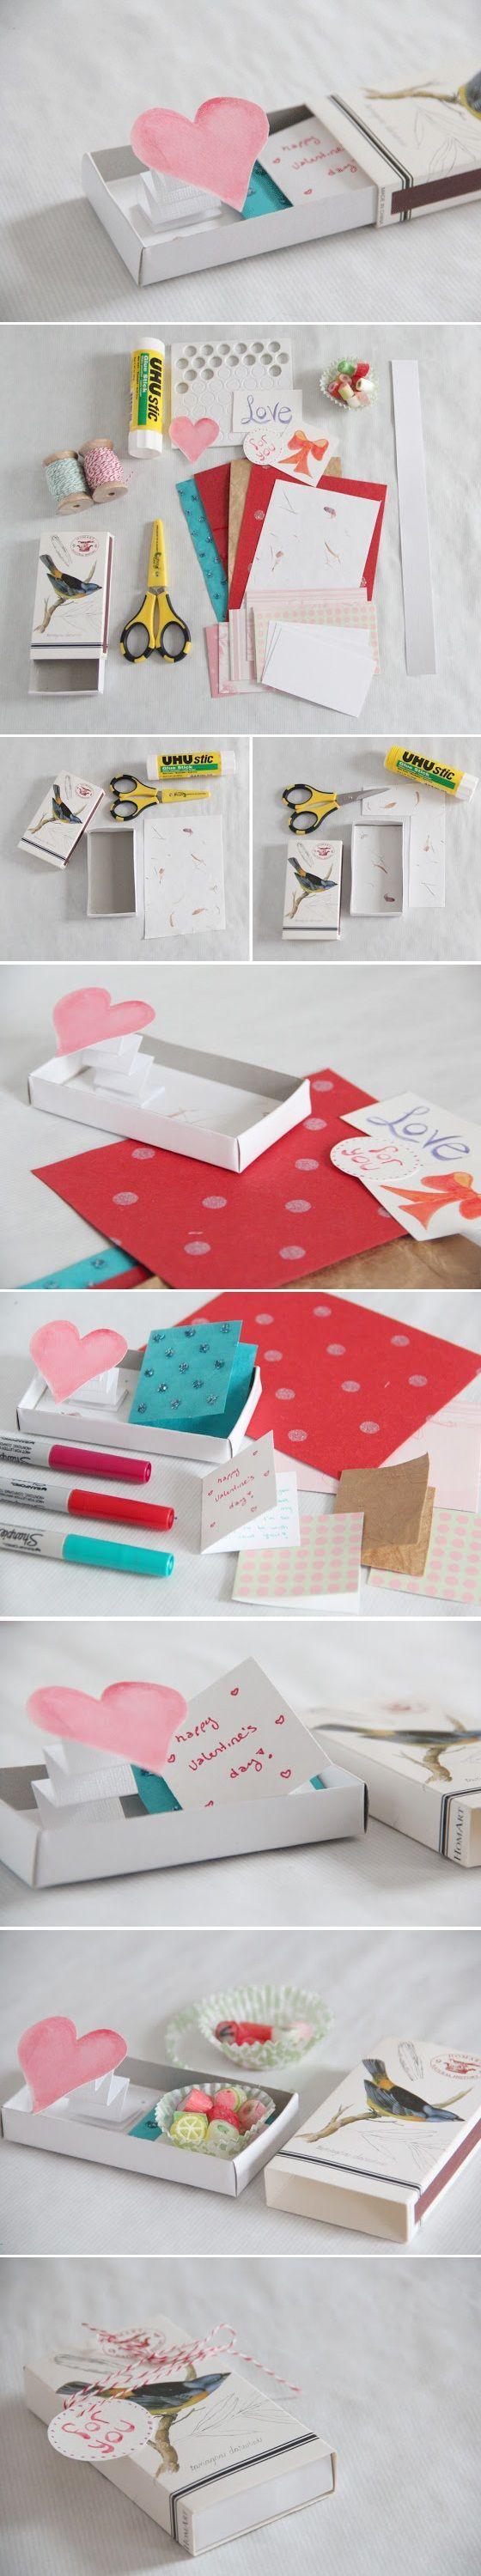 DIY Pop-Up Love Box